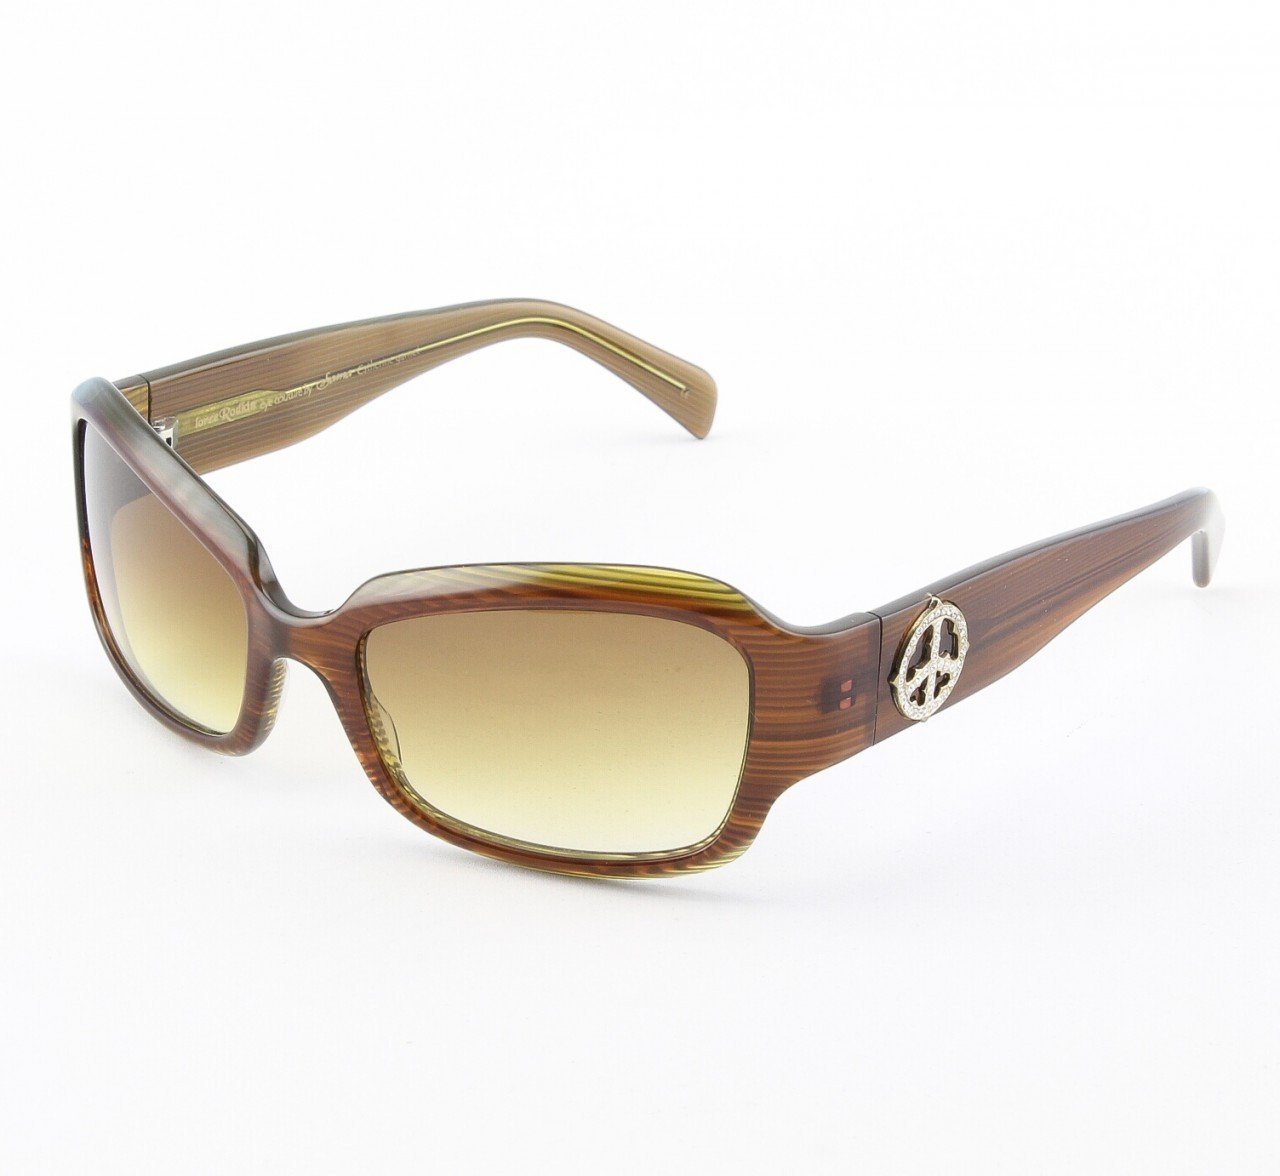 Loree Rodkin Catherine Sunglasses Garnet w/ Amber Lenses, Sterling Silver, Swarovski Crystals